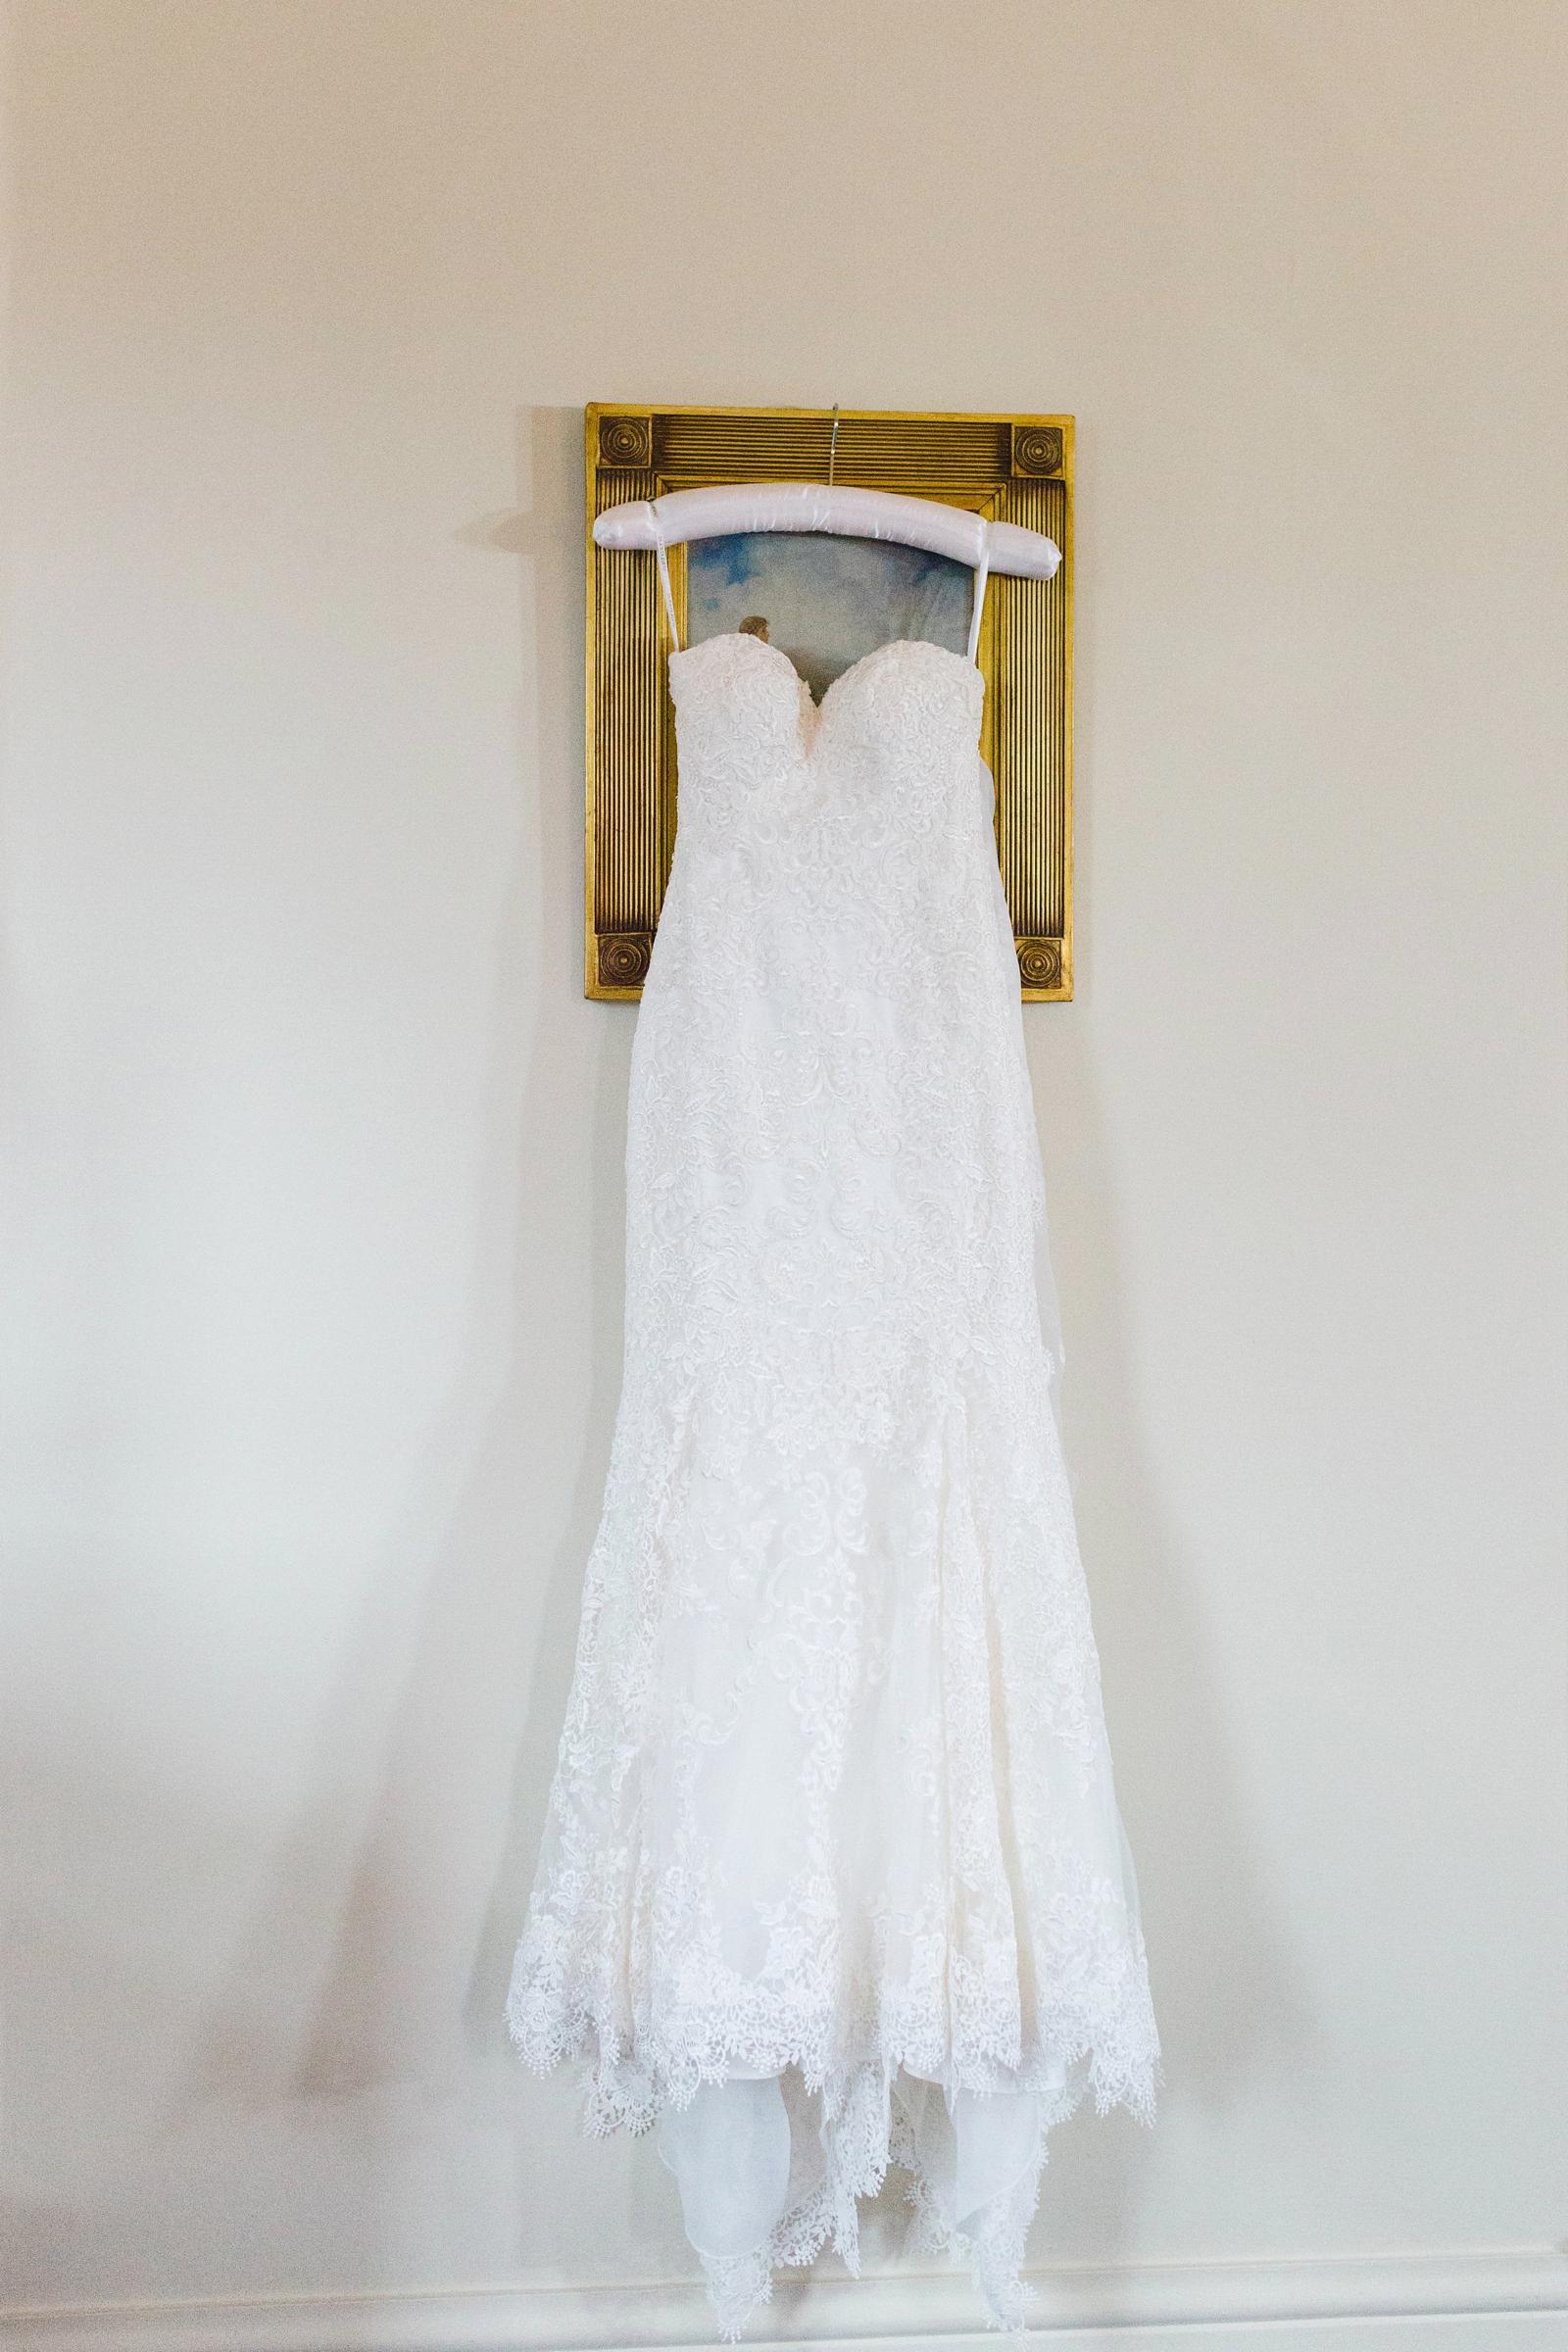 weddingbalmoralhoteledinburgh1-11.jpg